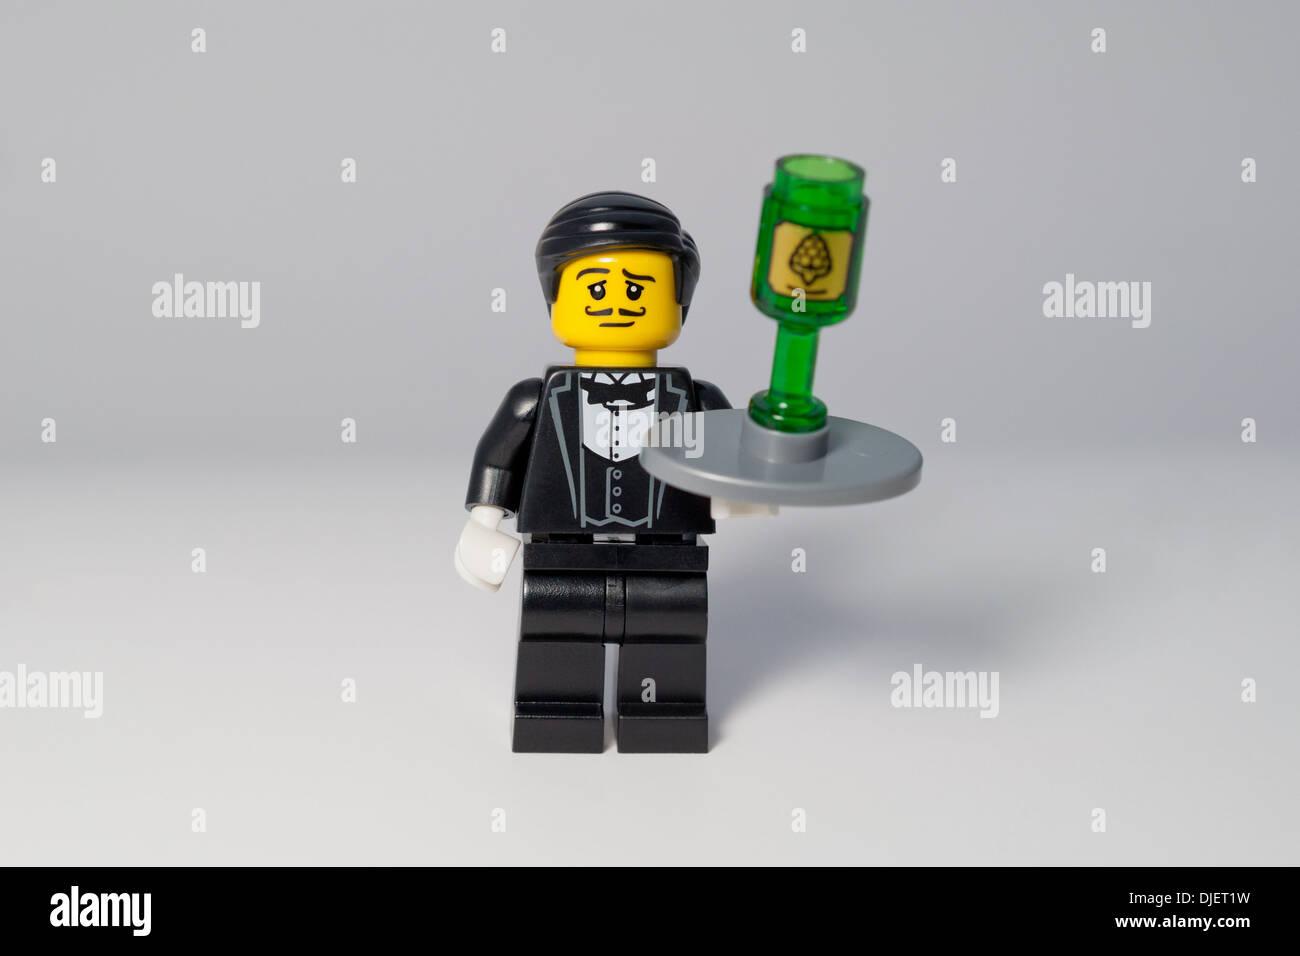 Lego Minifigure of a wine waiter - Stock Image